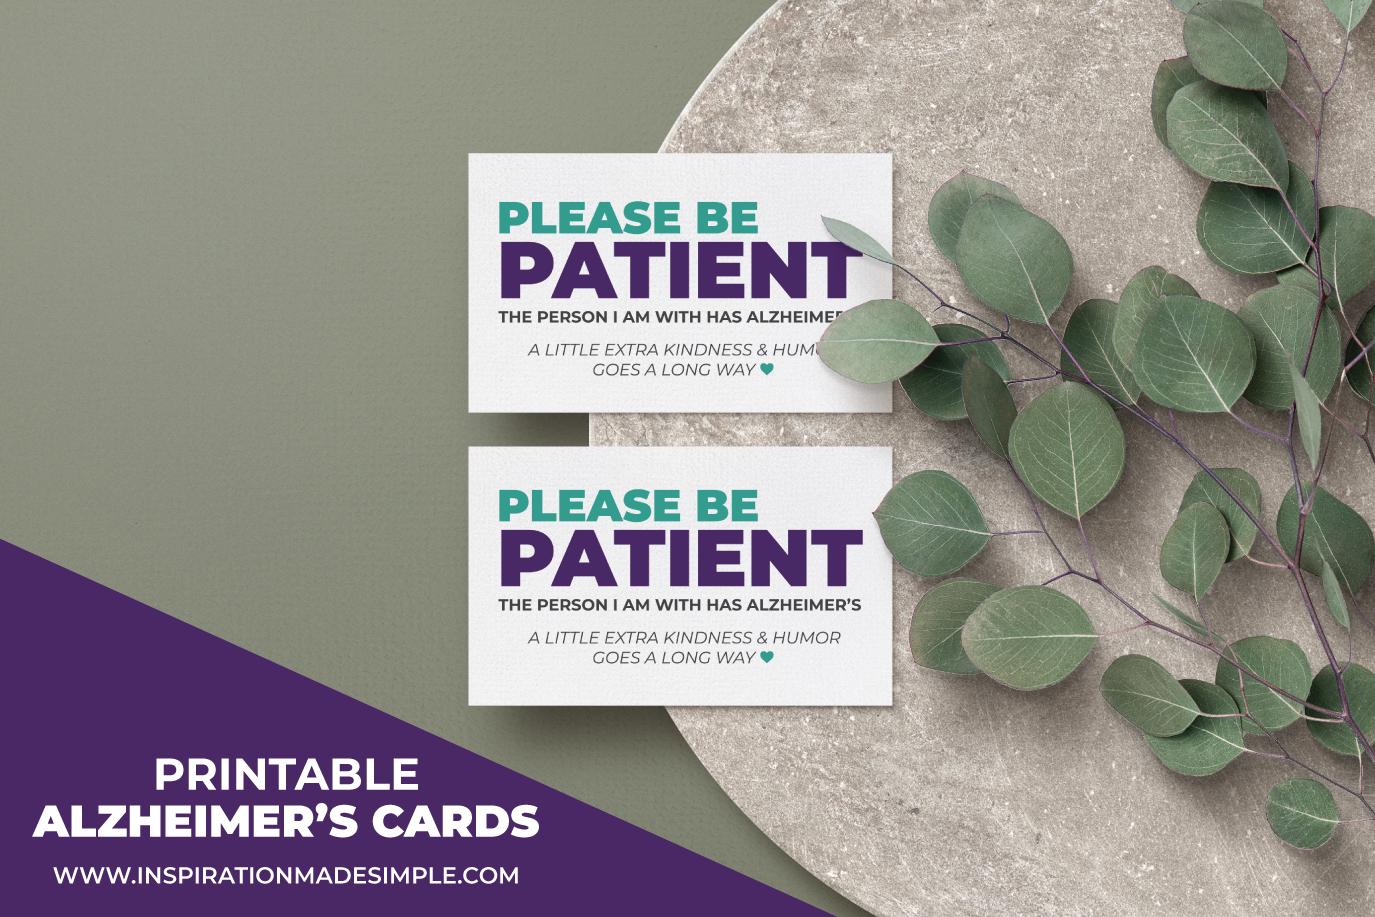 Printable Caregiver Cards for Alzheimer's